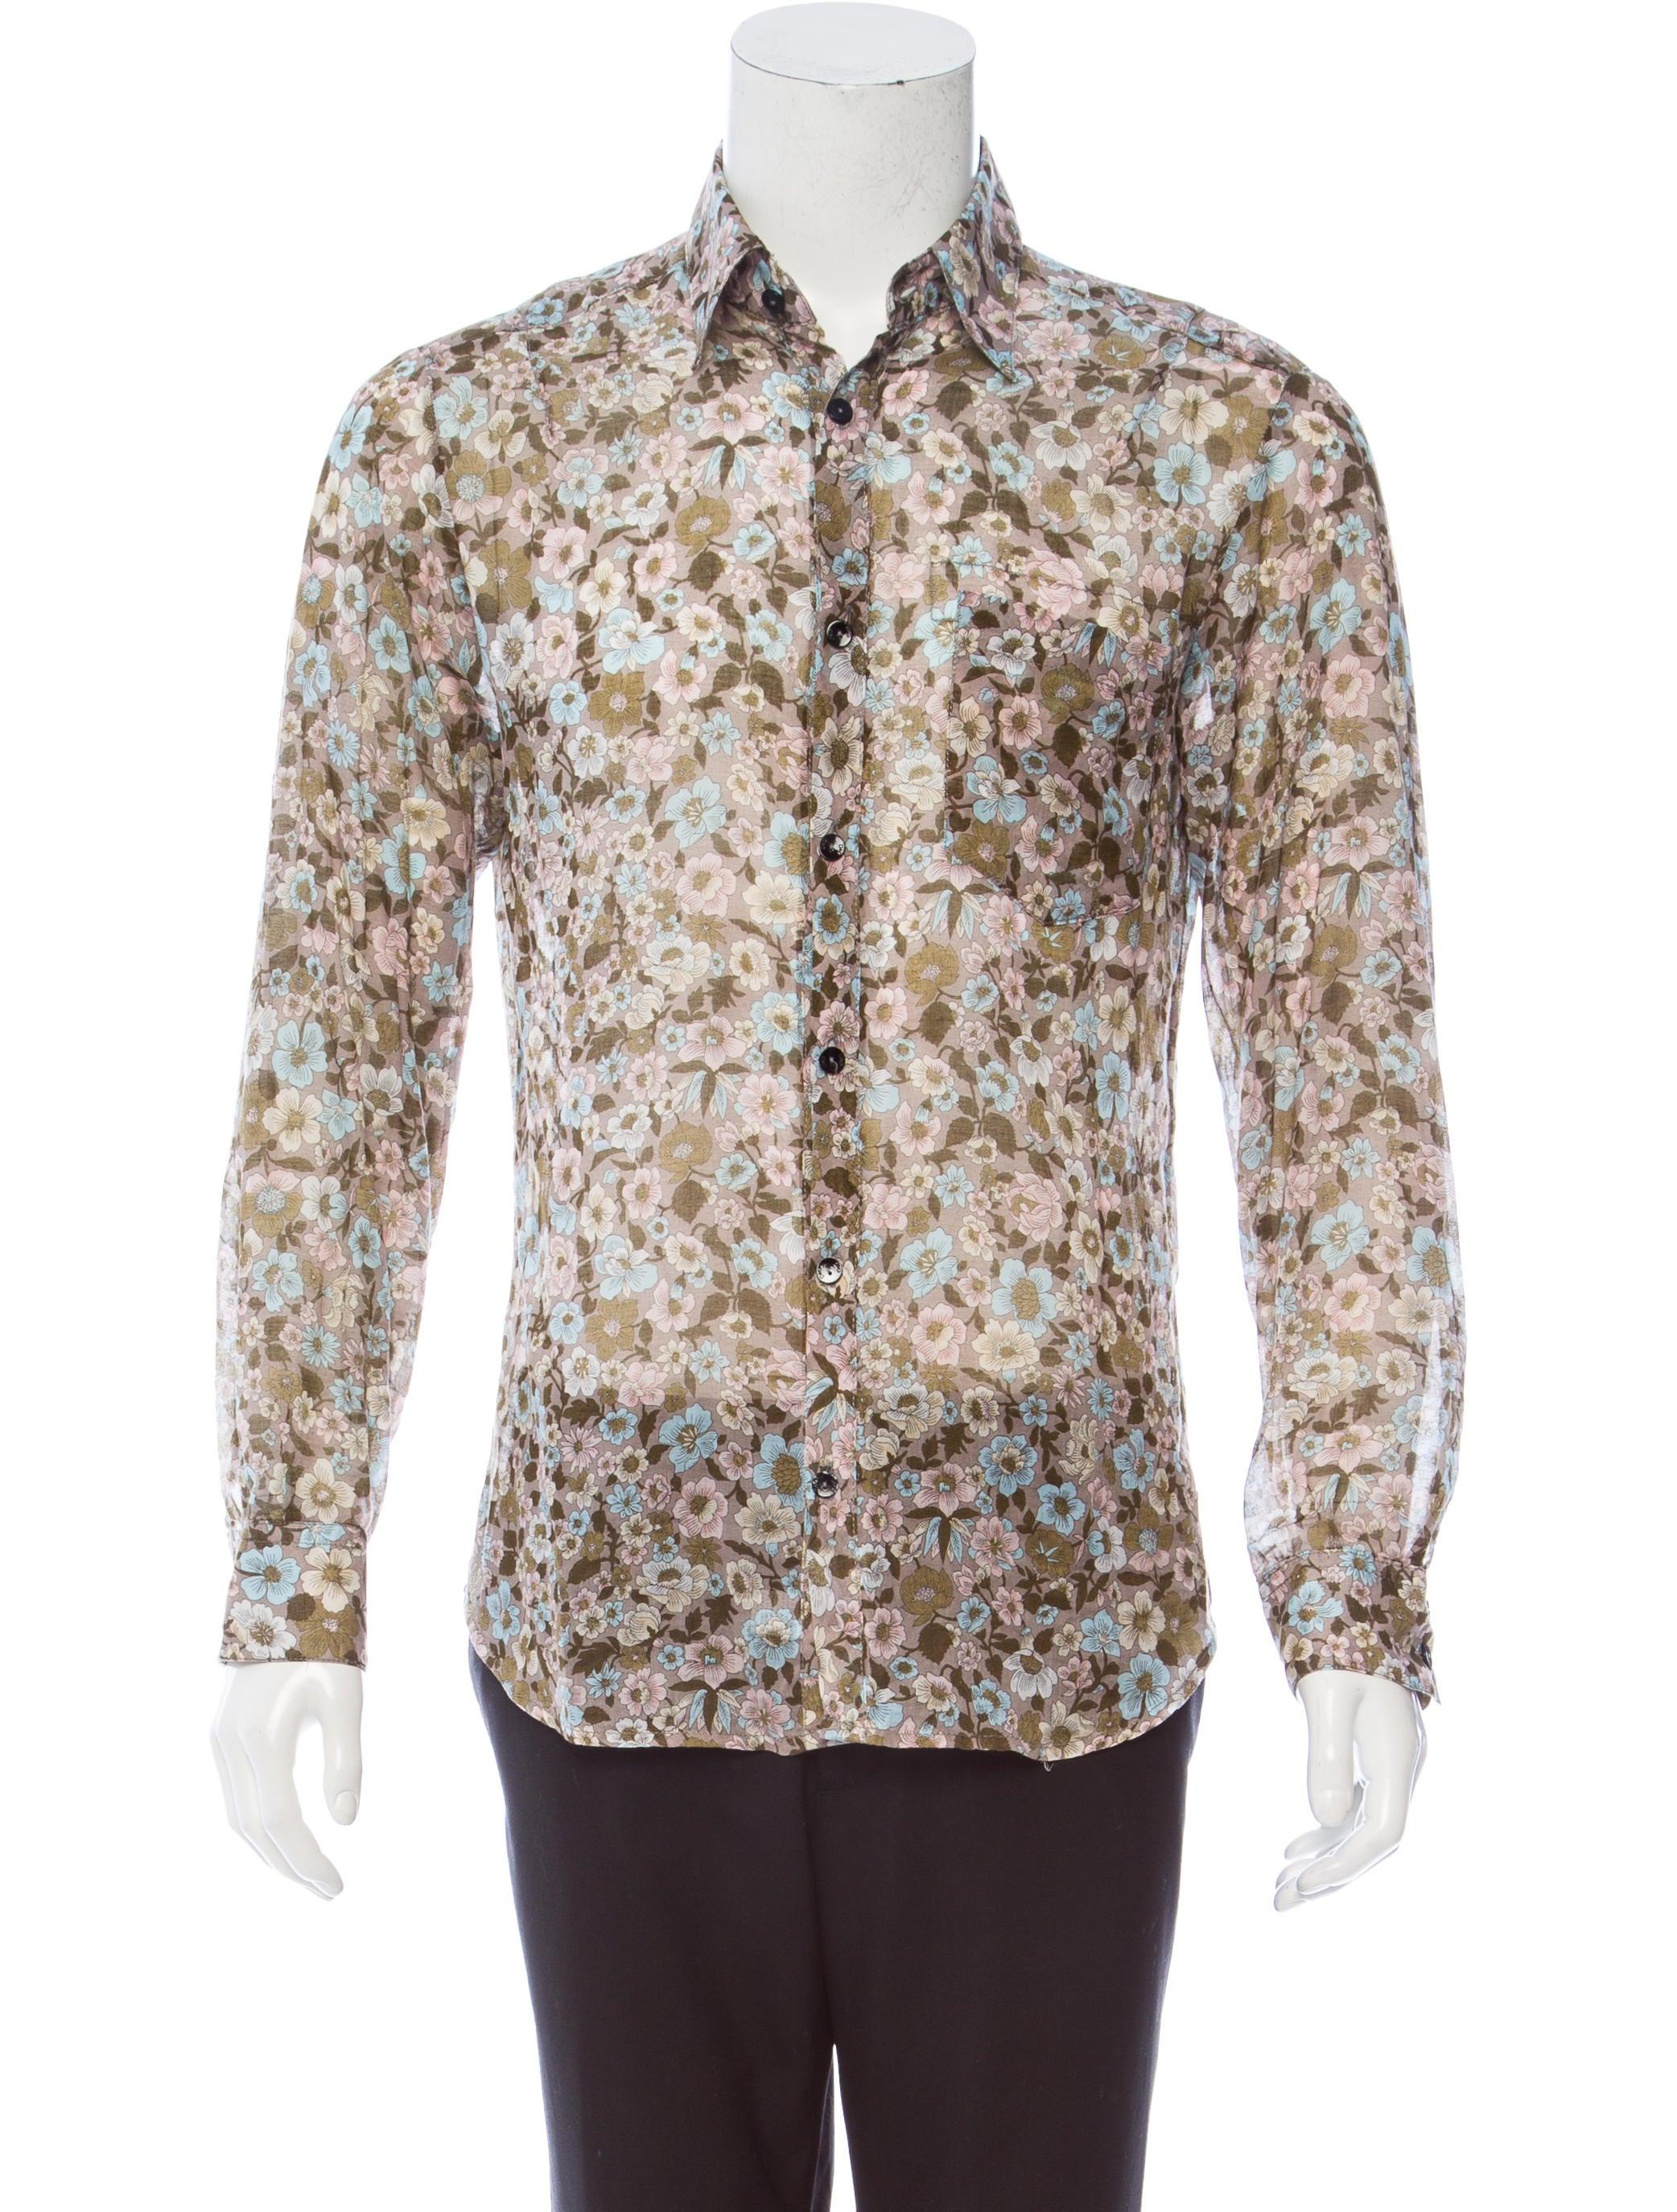 D g floral print button up shirt clothing wdg38163 for Floral print button up shirt